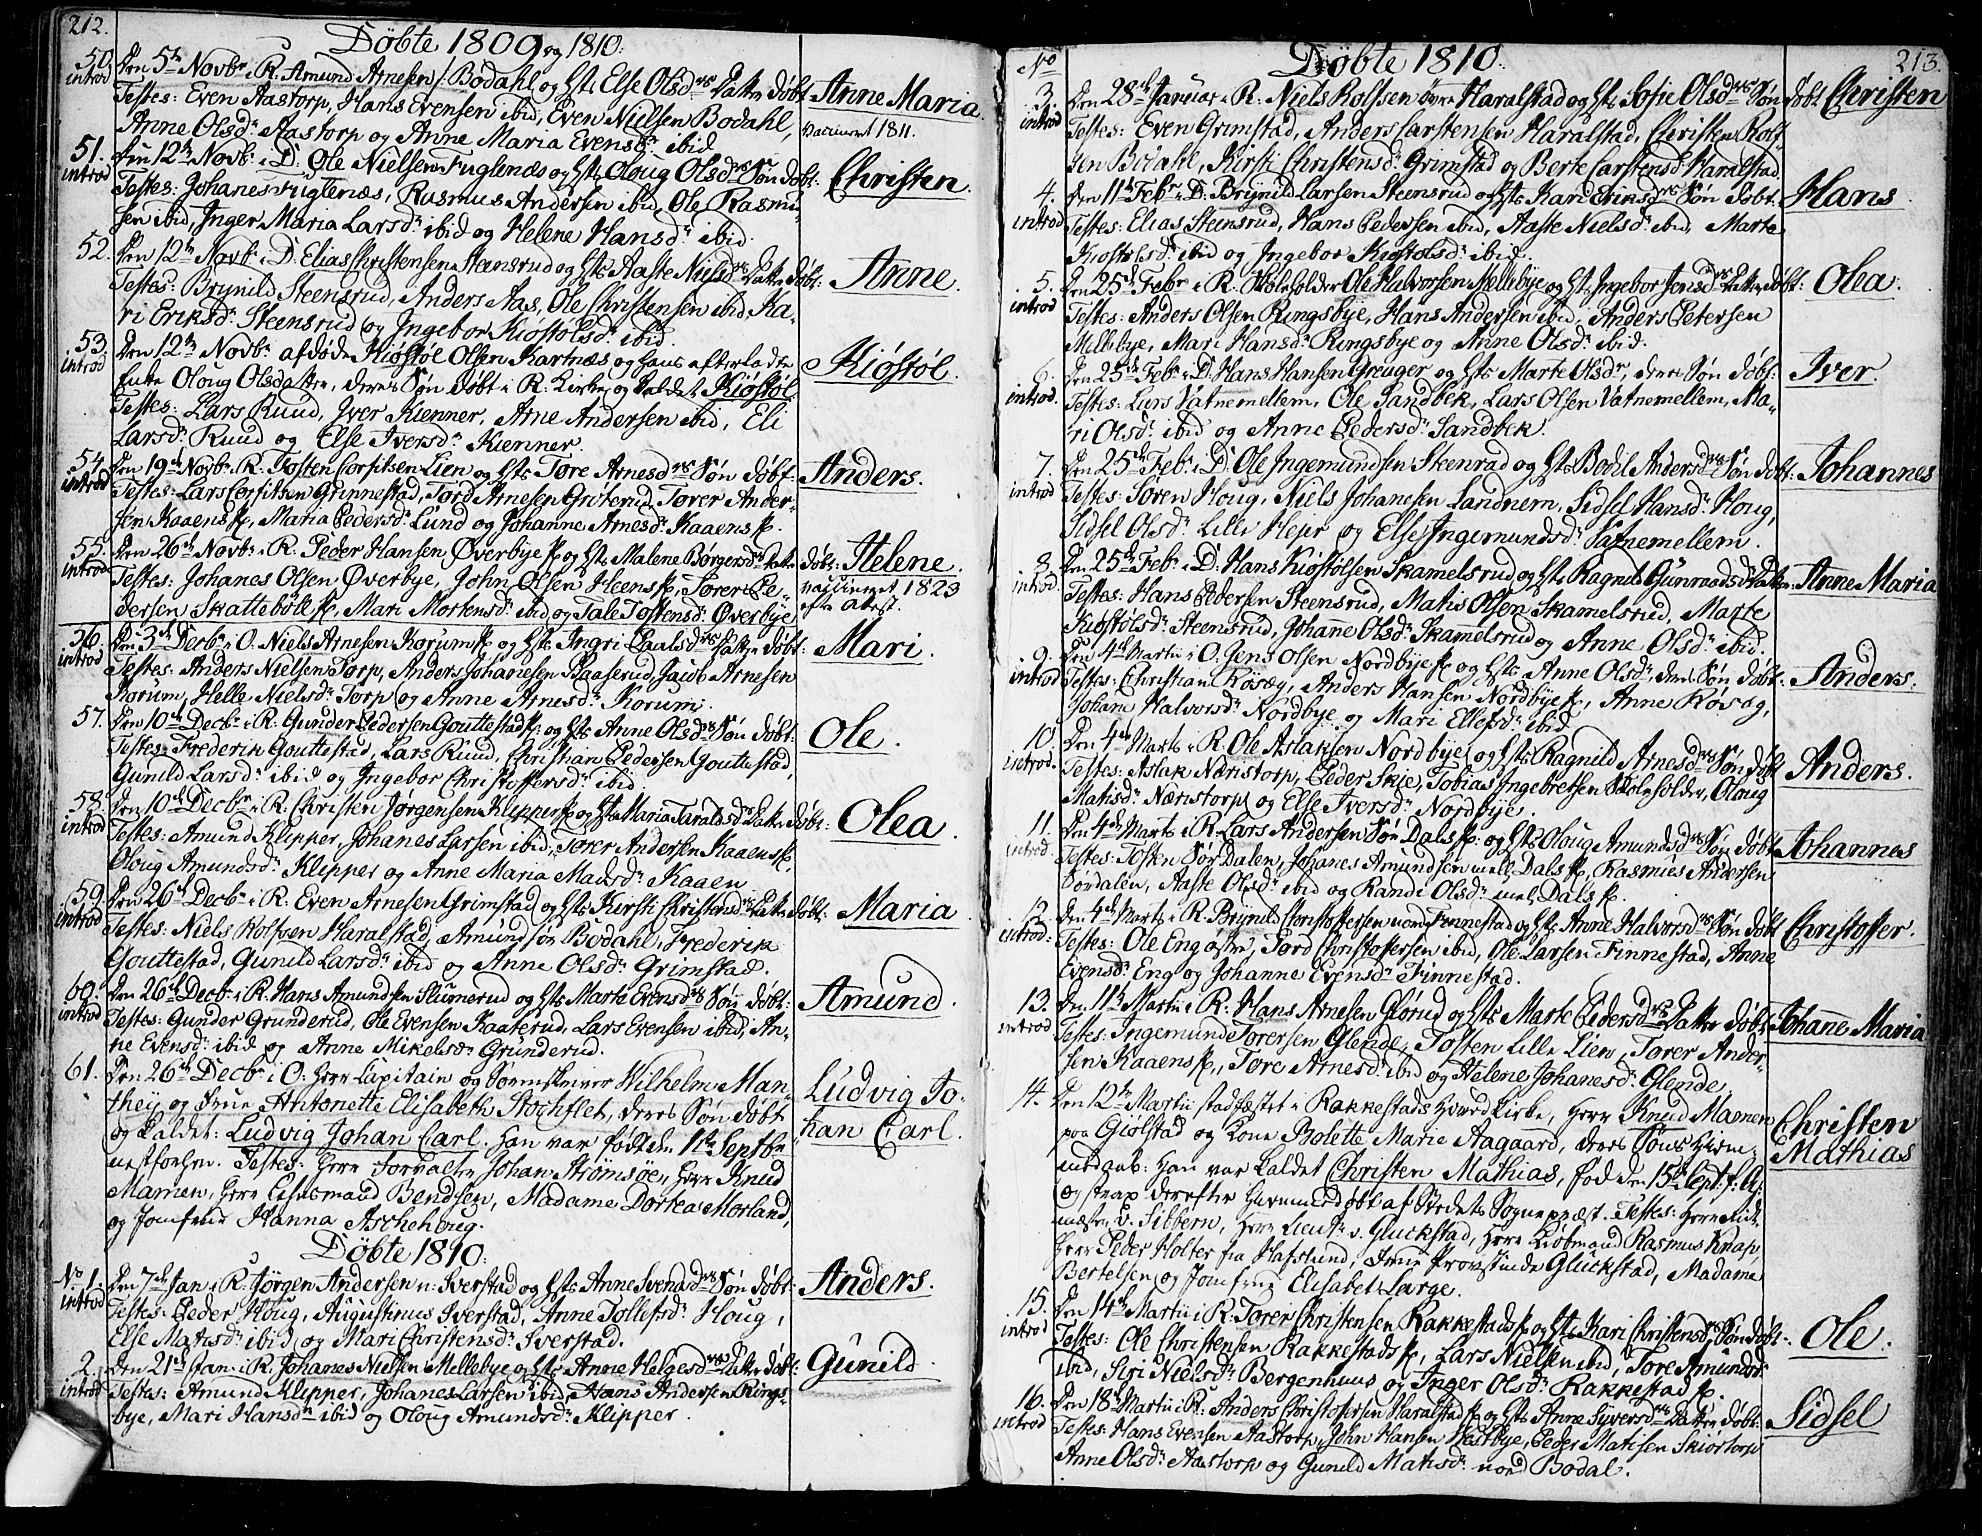 SAO, Rakkestad prestekontor Kirkebøker, F/Fa/L0005: Ministerialbok nr. I 5, 1784-1814, s. 212-213